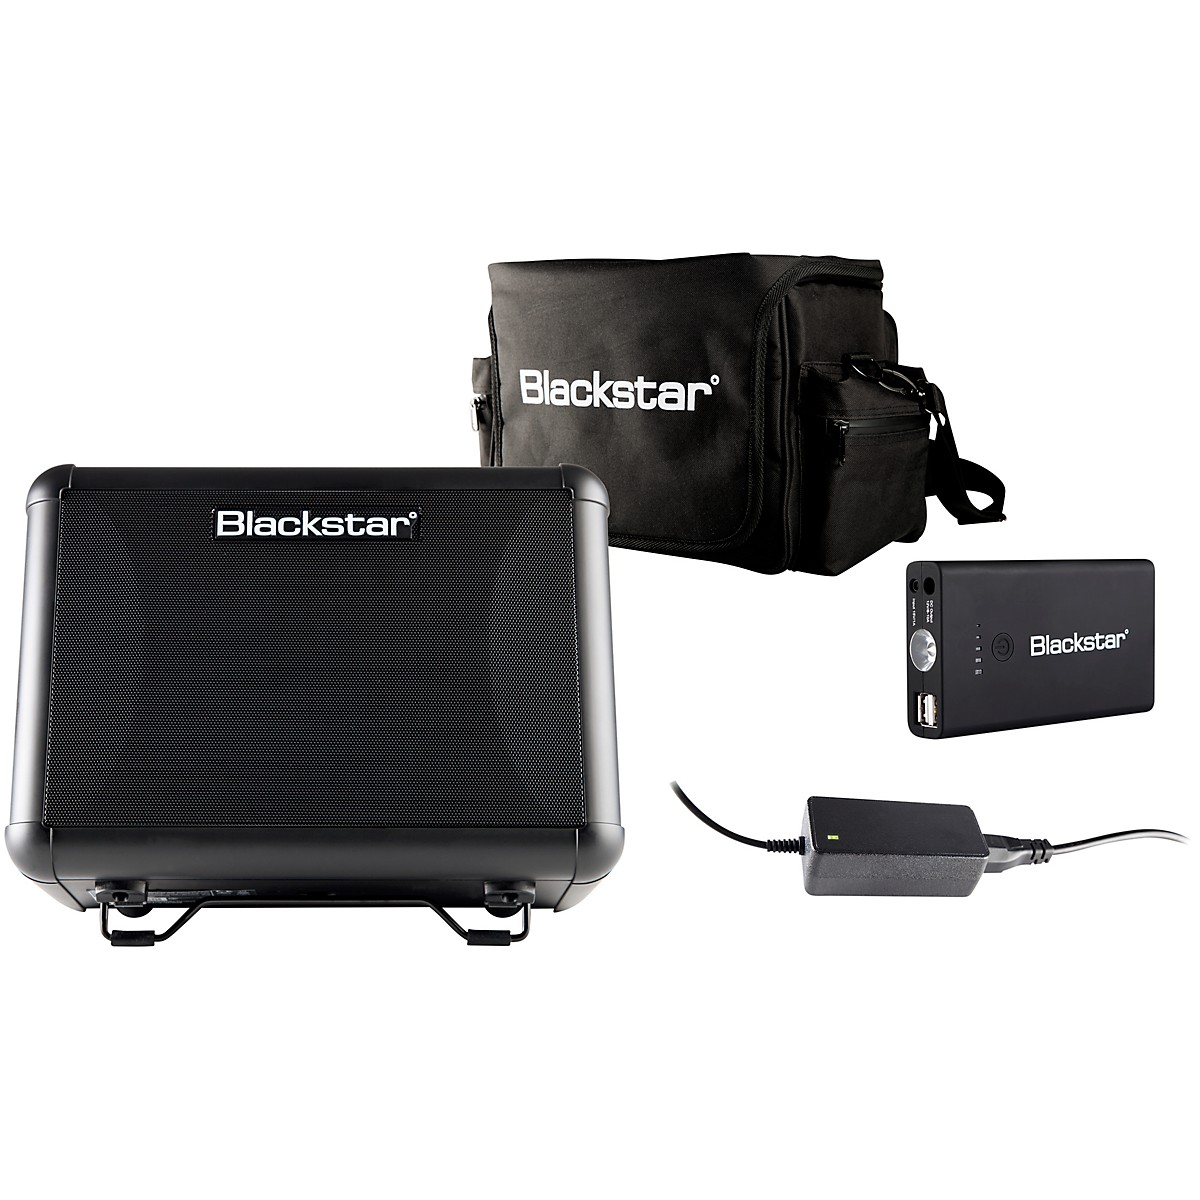 Blackstar Super Fly Street Pack